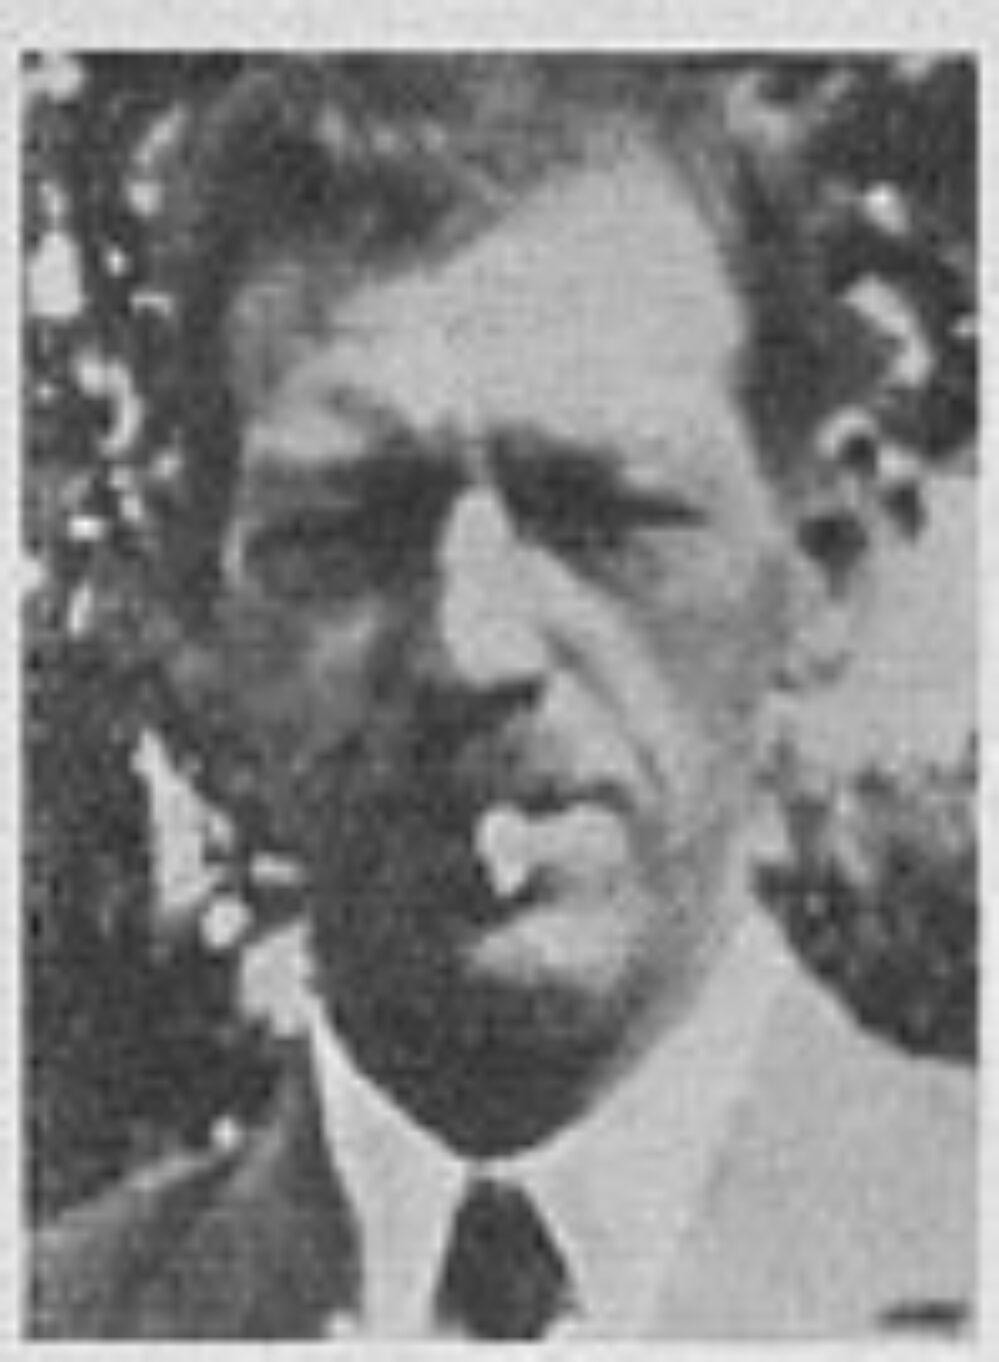 Nils Johan Rasmussen